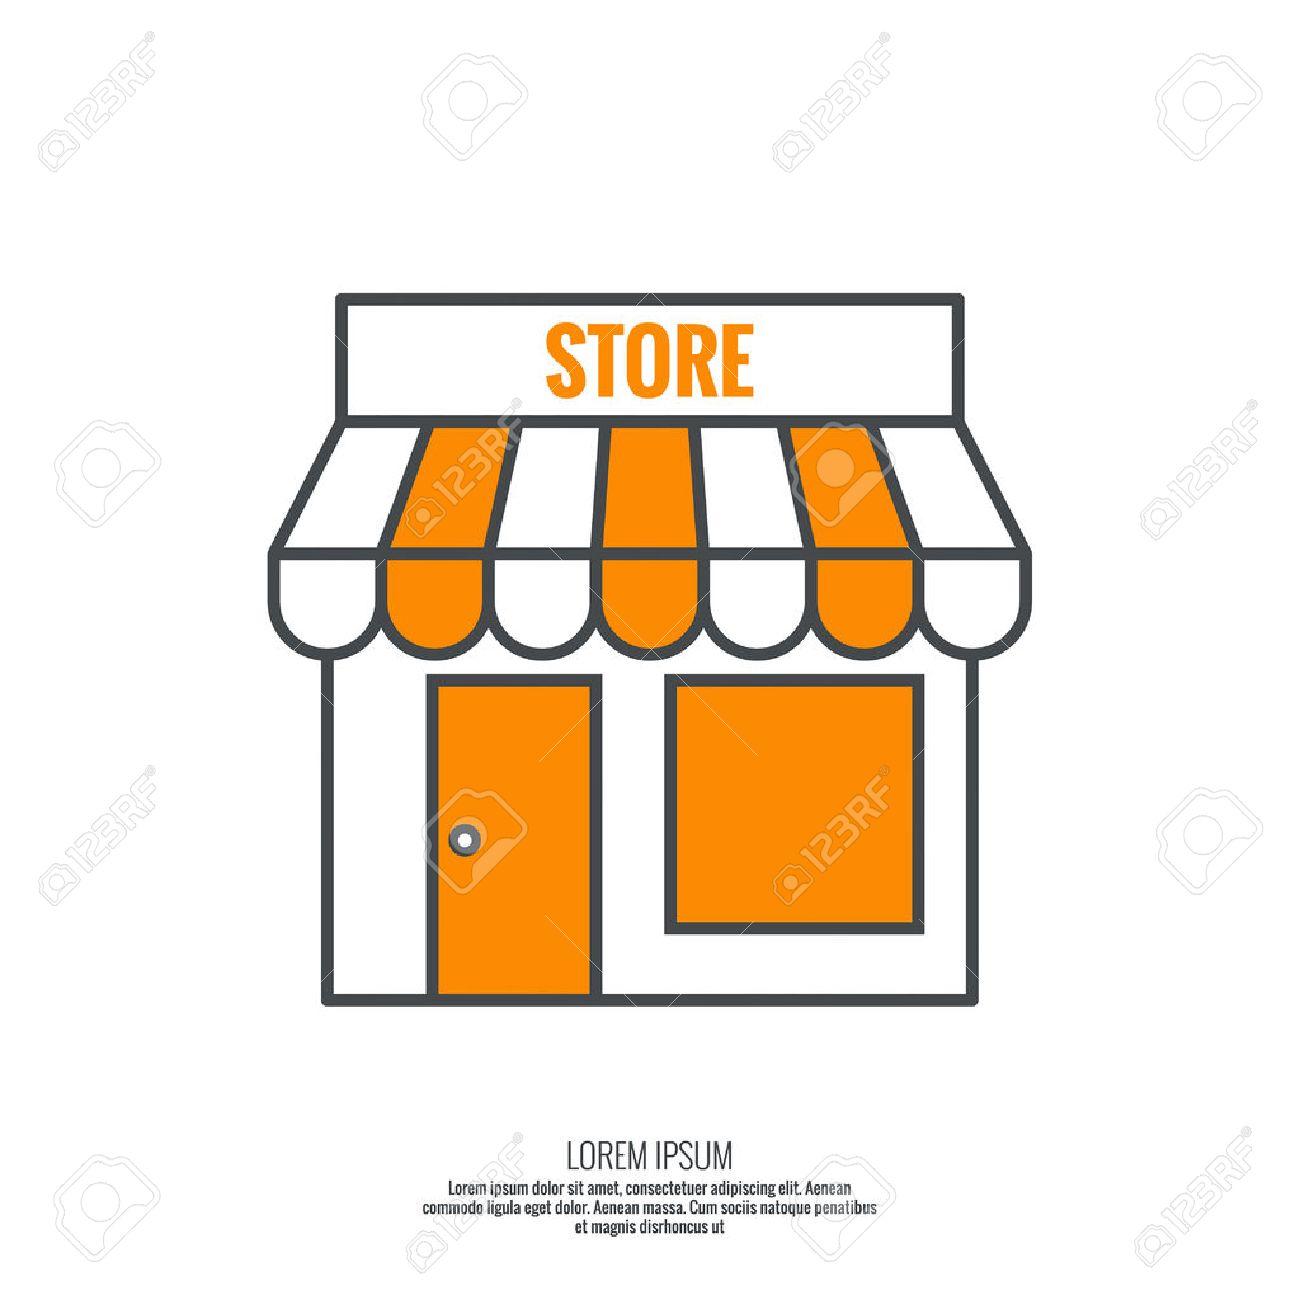 1300x1300 Facade Of Shops, Supermarkets, Marketplace. Pictogram Icon